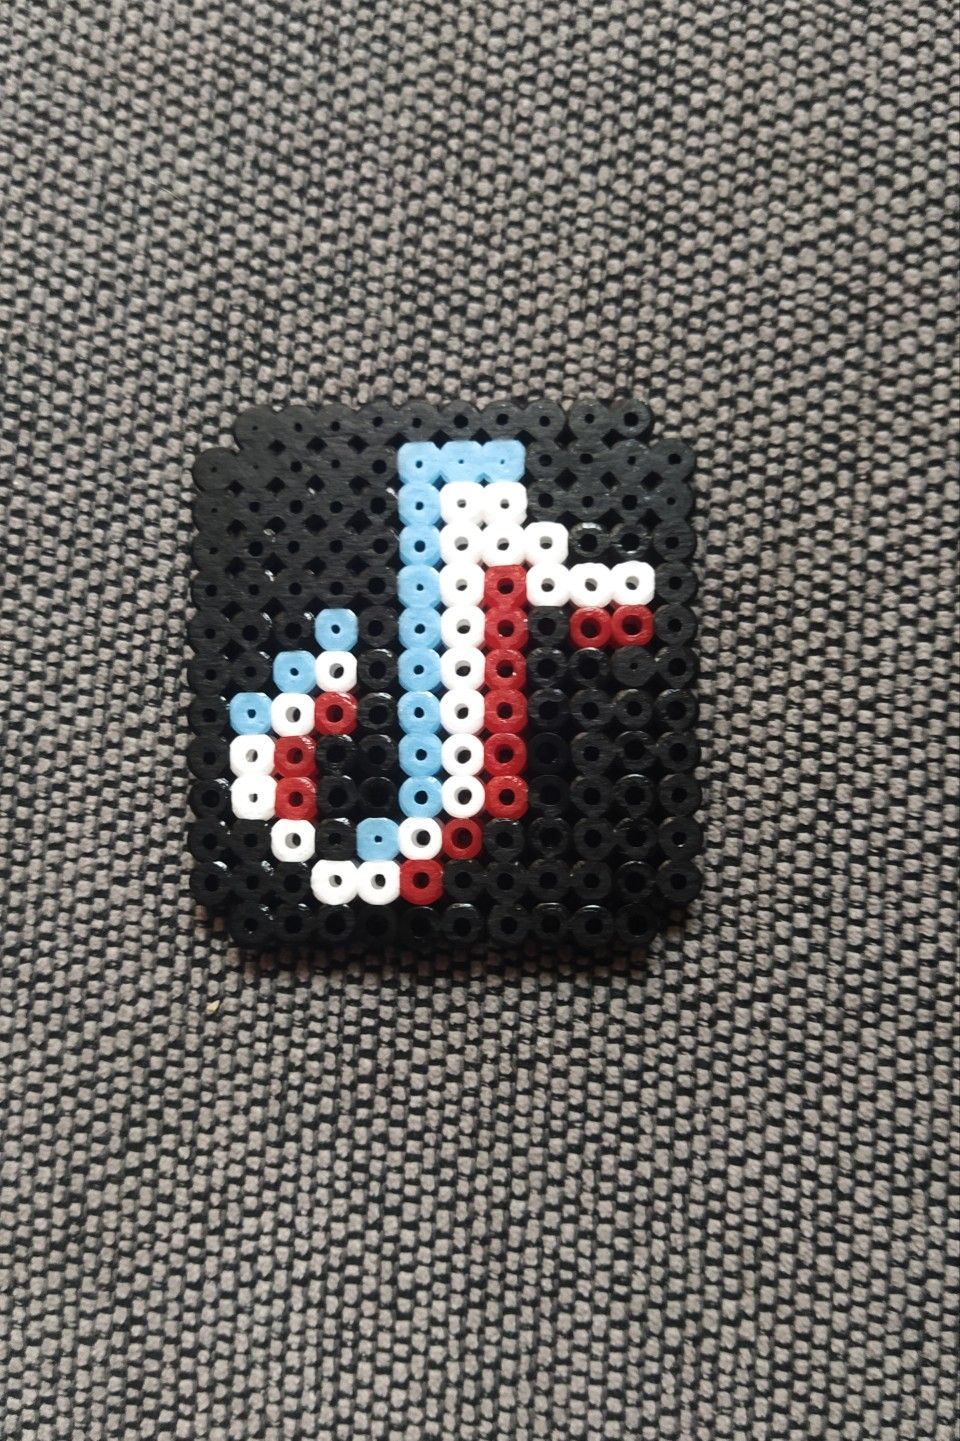 Tiktok Logo Hama Melt Beads Patterns Hamma Beads Ideas Perler Bead Disney